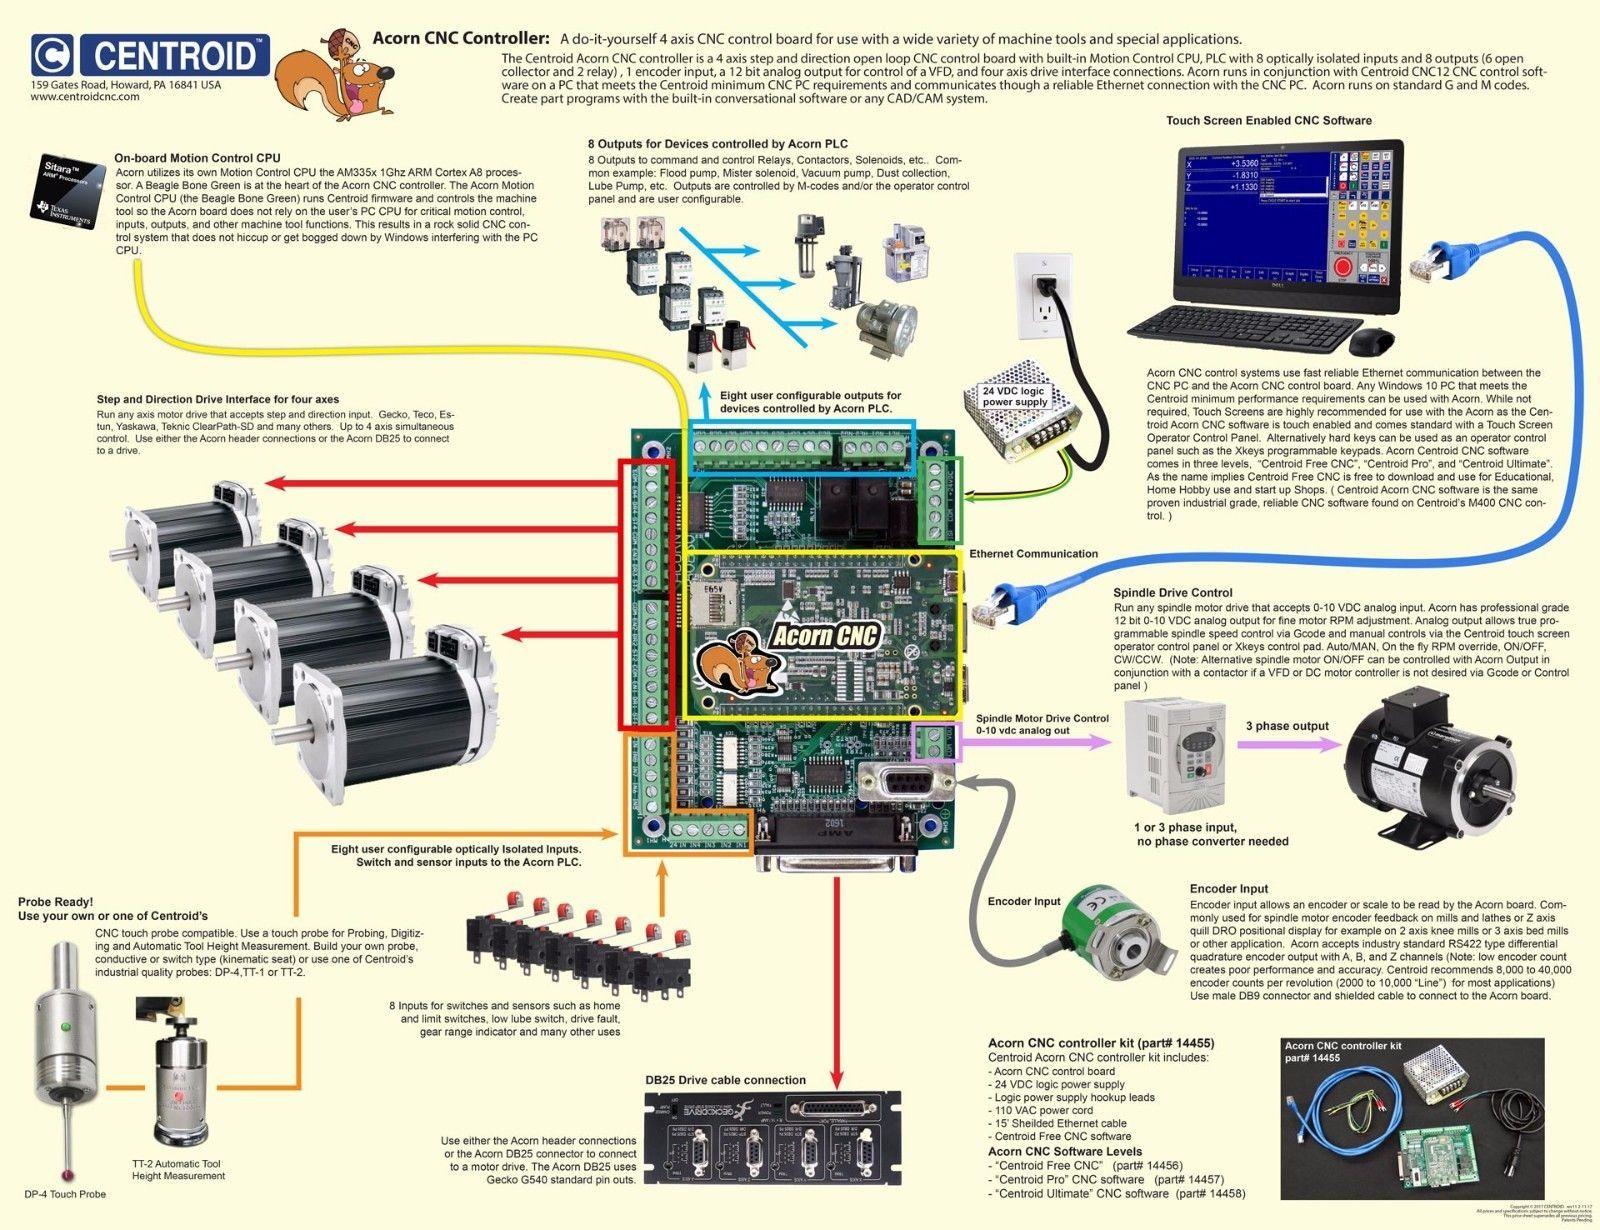 cnc ethernet motion controller kit centroid acorn control better than mach3 4 ebay [ 1600 x 1230 Pixel ]